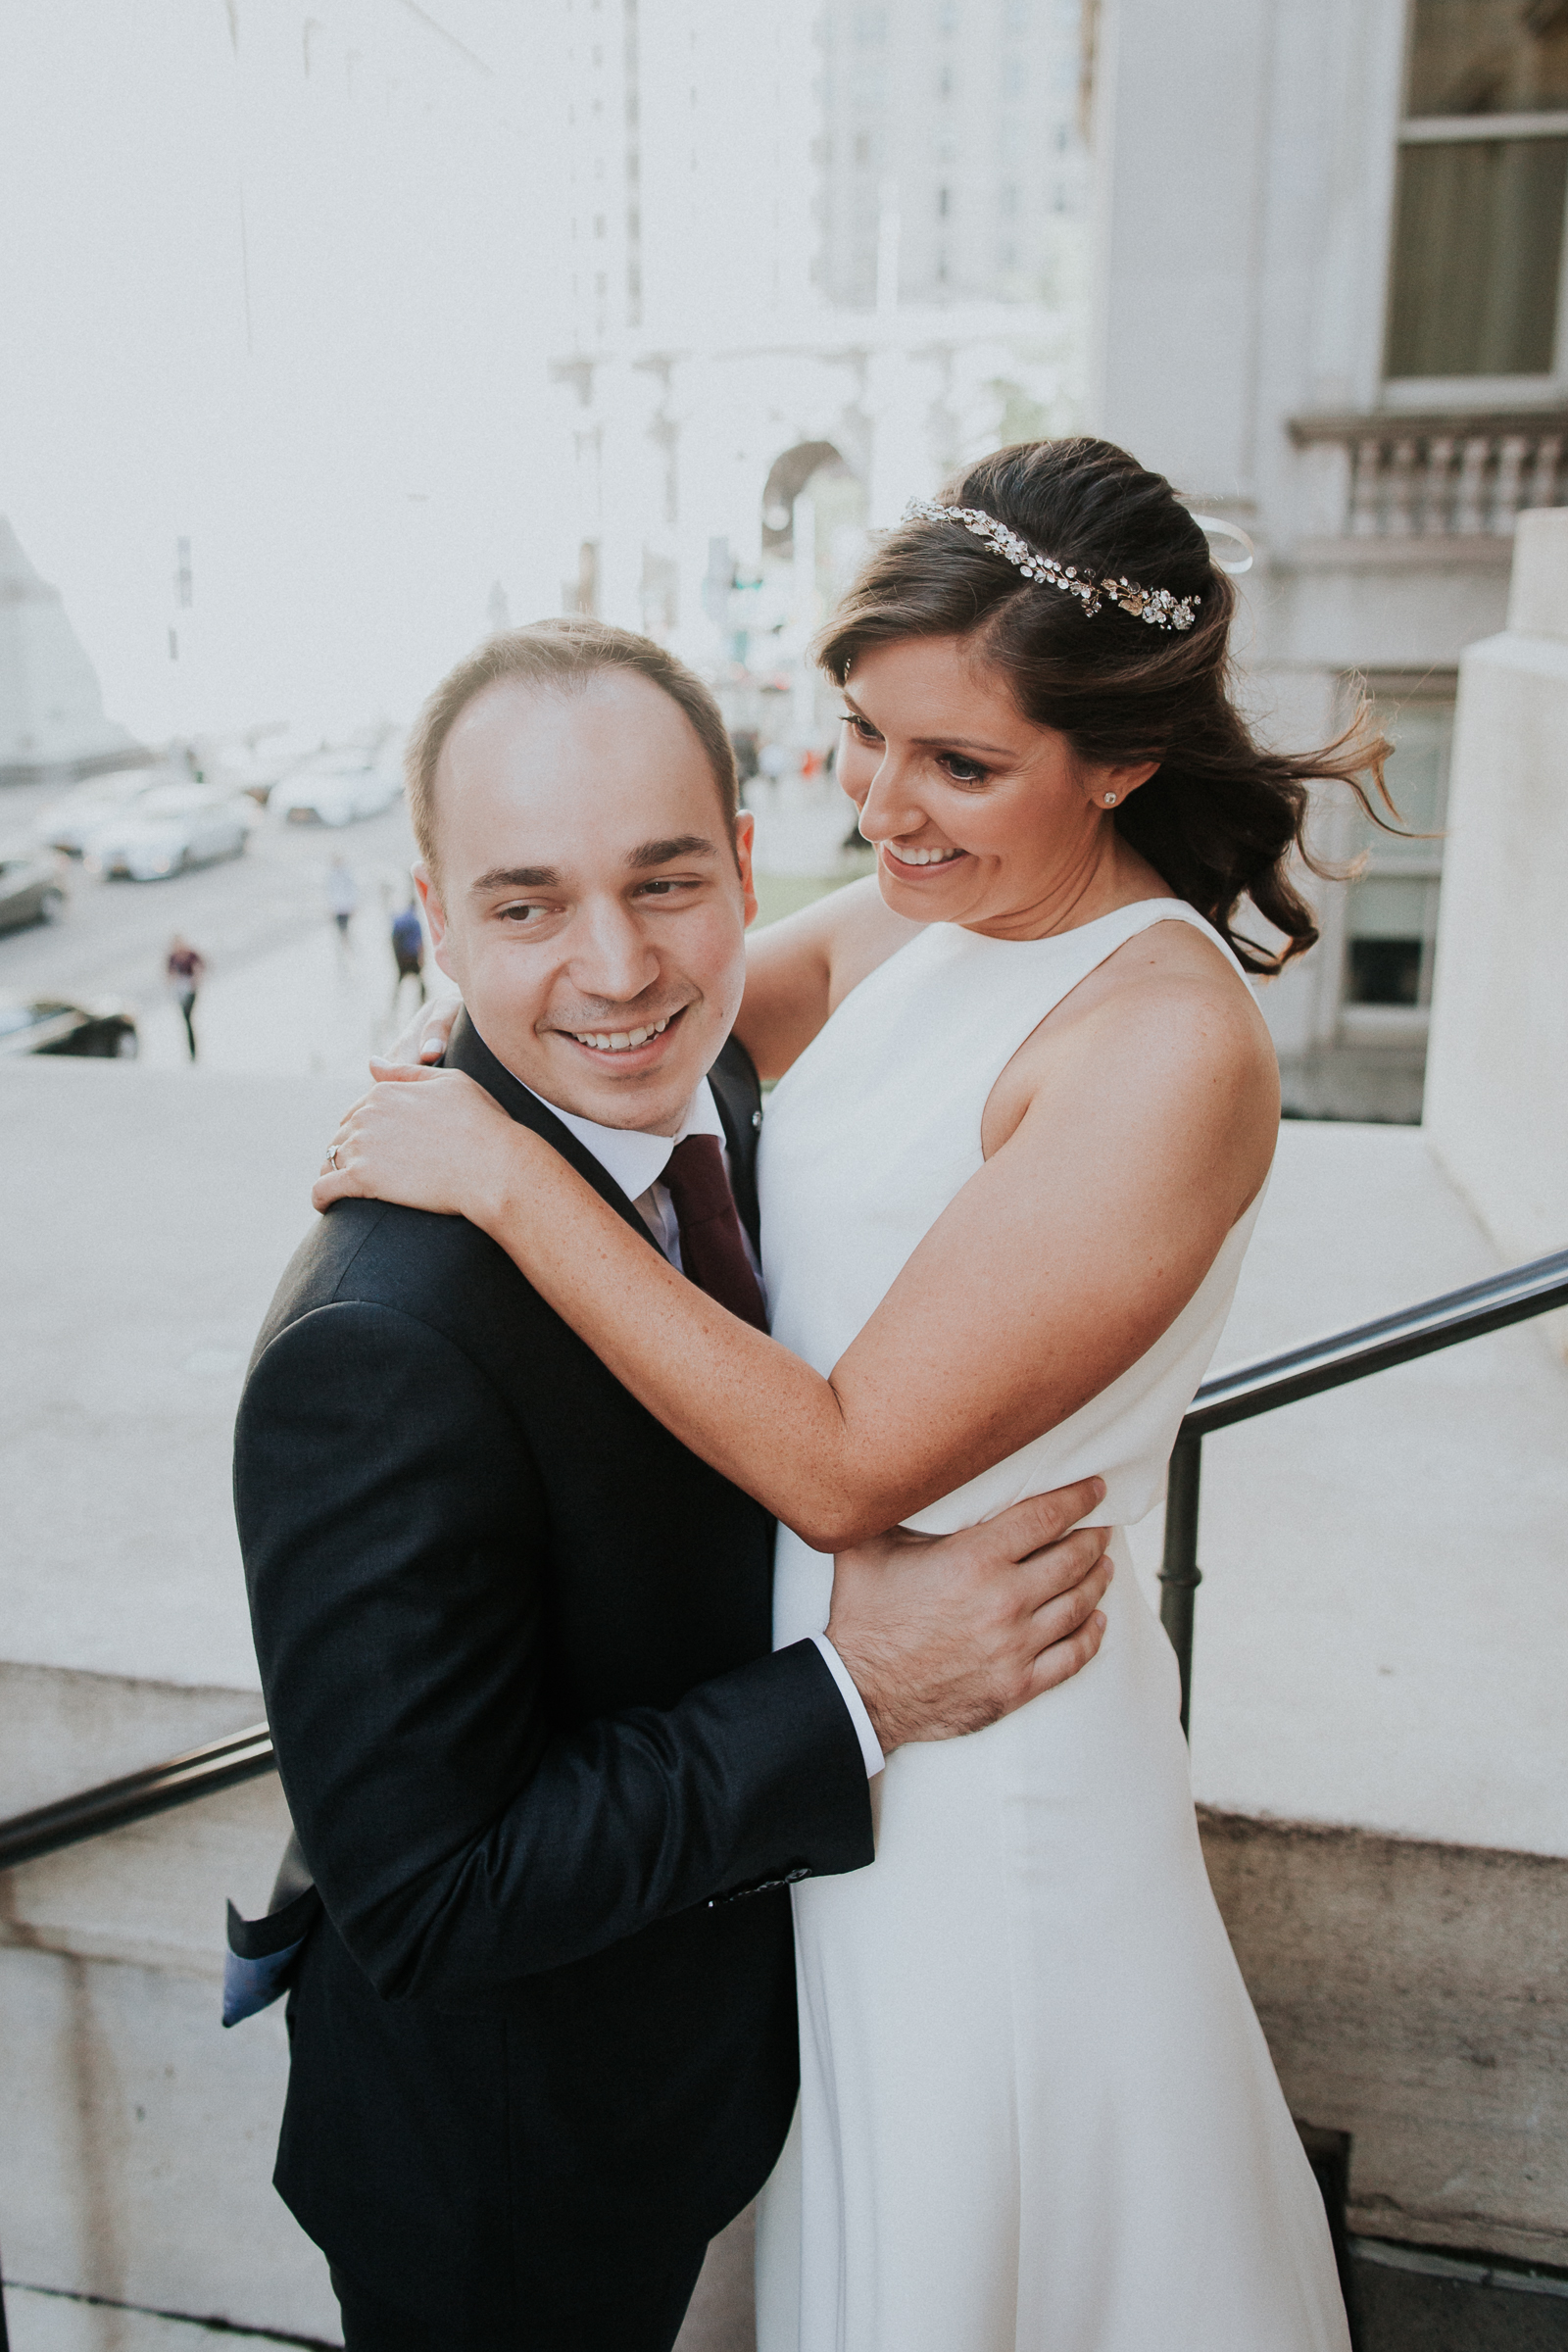 Casa-Apicii-Intimate-Wedding-City-Hall-Elopement-New-York-Documentary-Wedding-Photographer-22.jpg